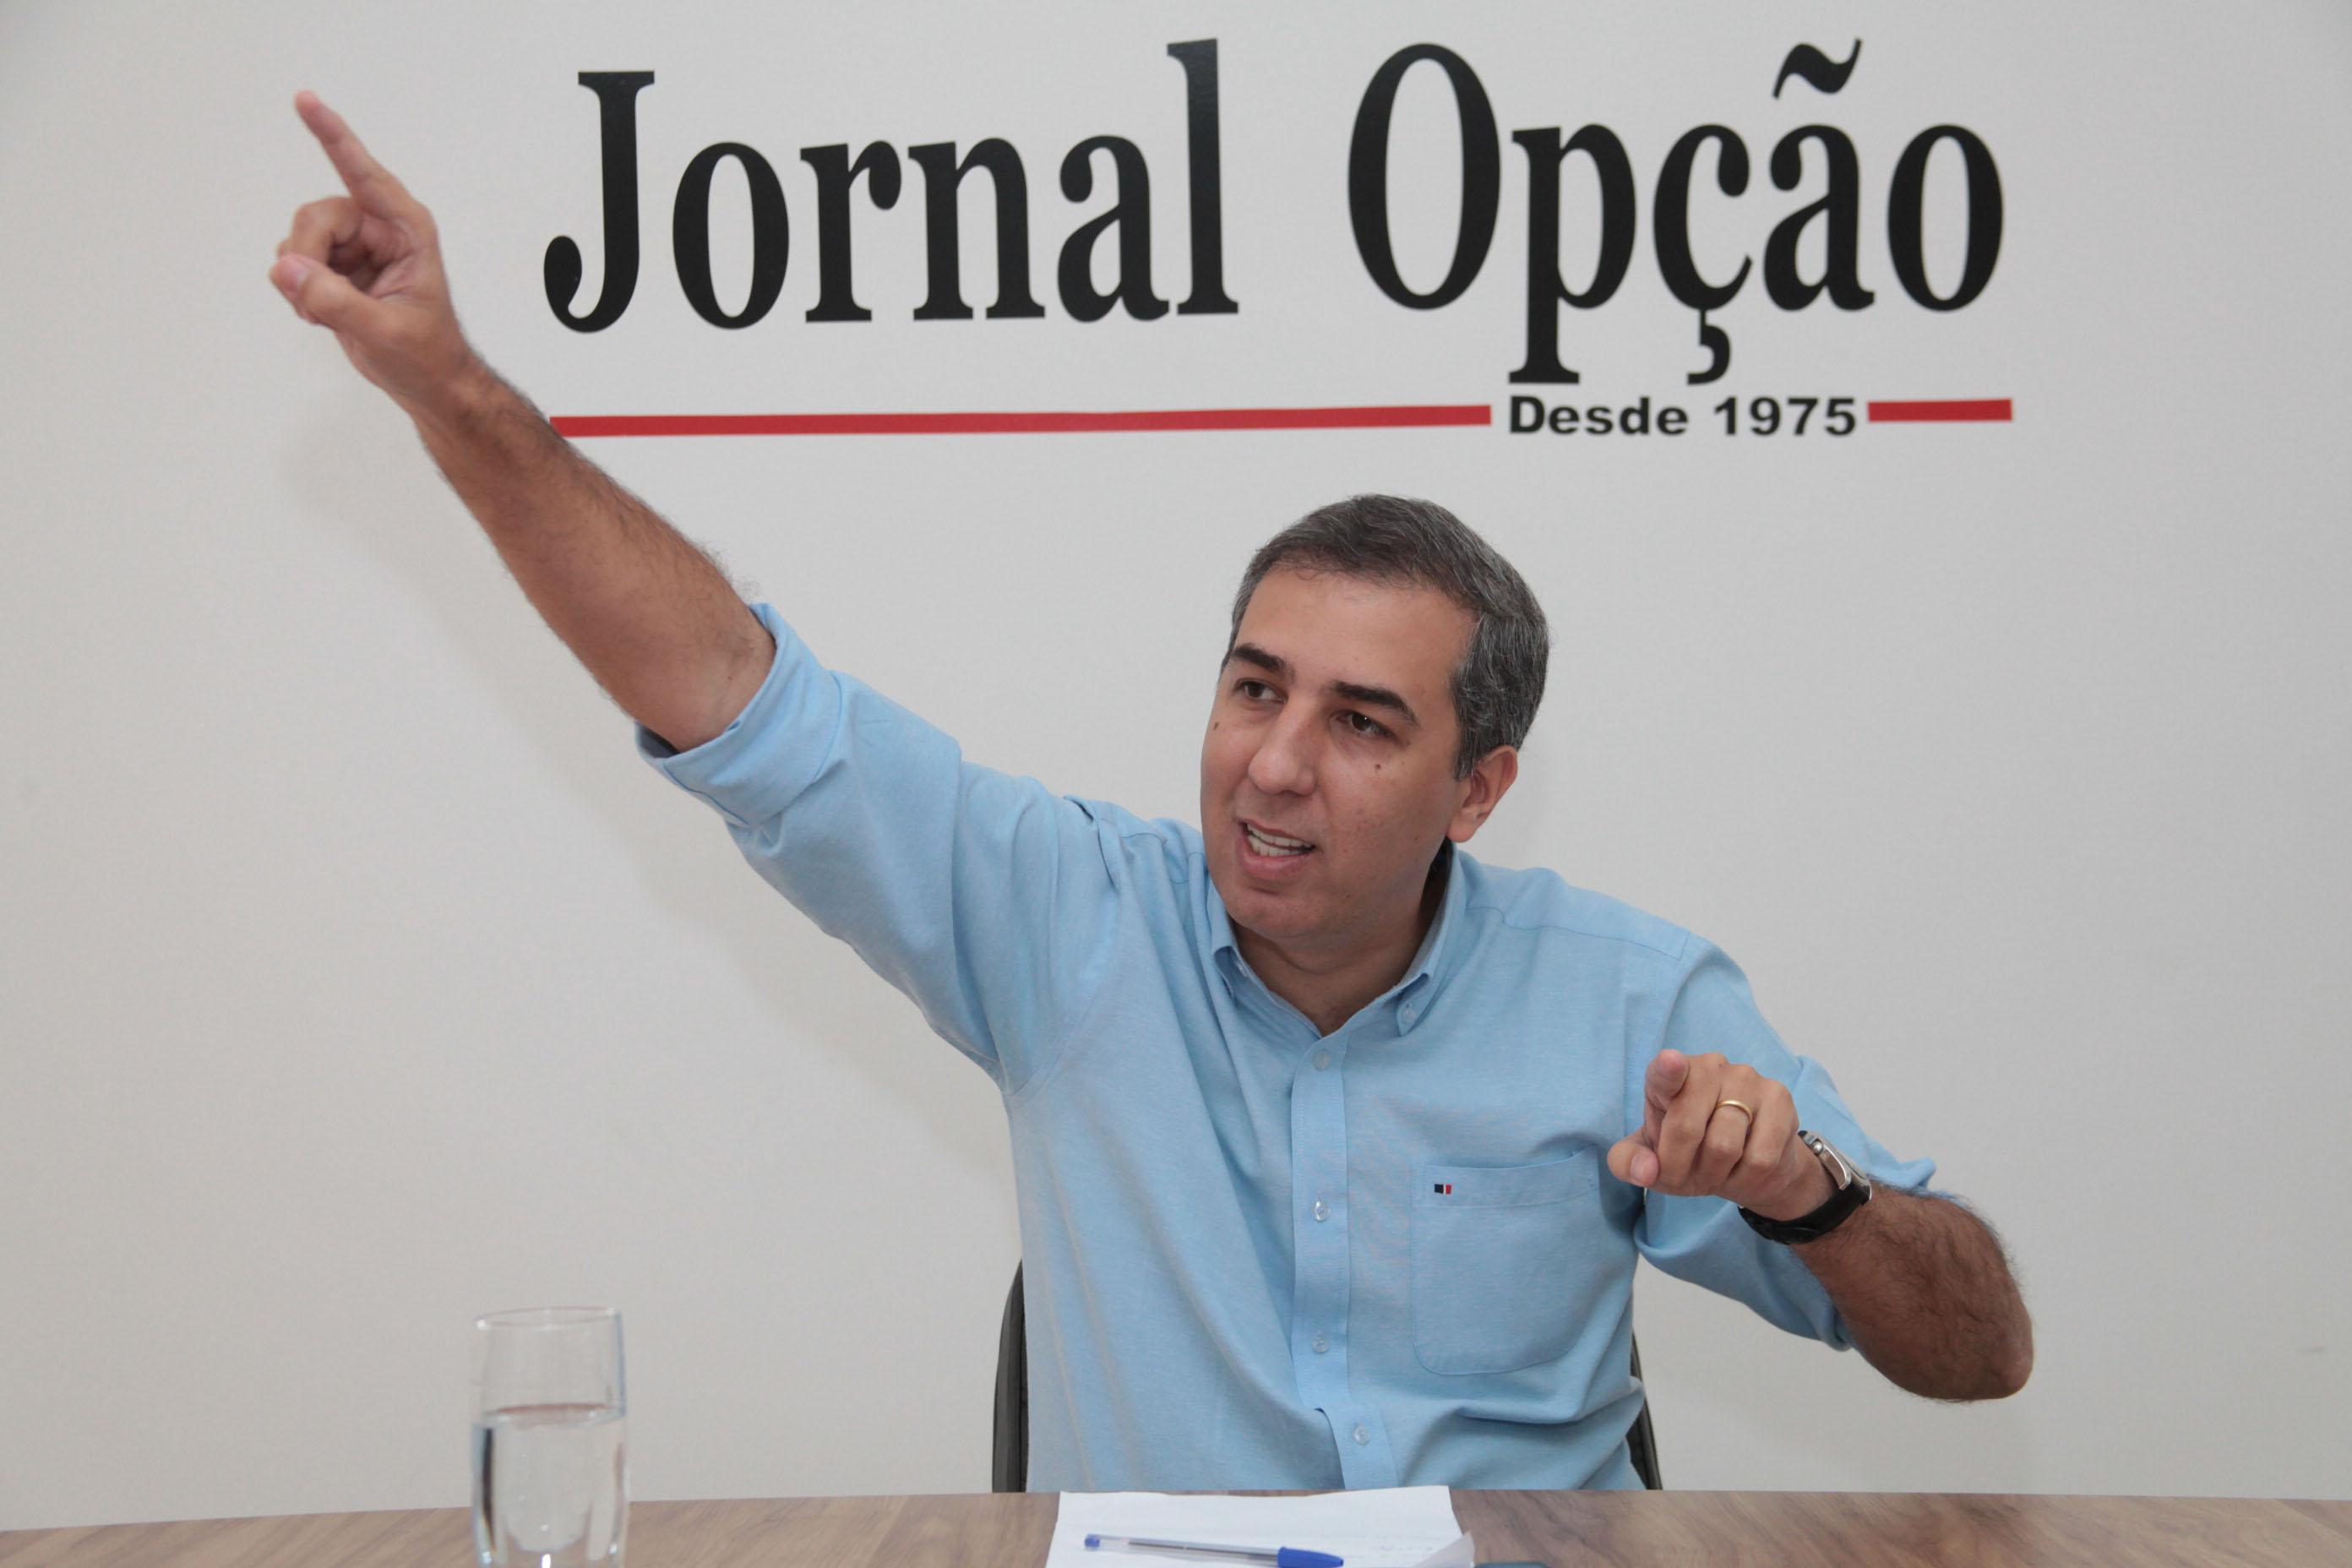 José Eliton vai governar Goiás durante quase todo o mês de janeiro